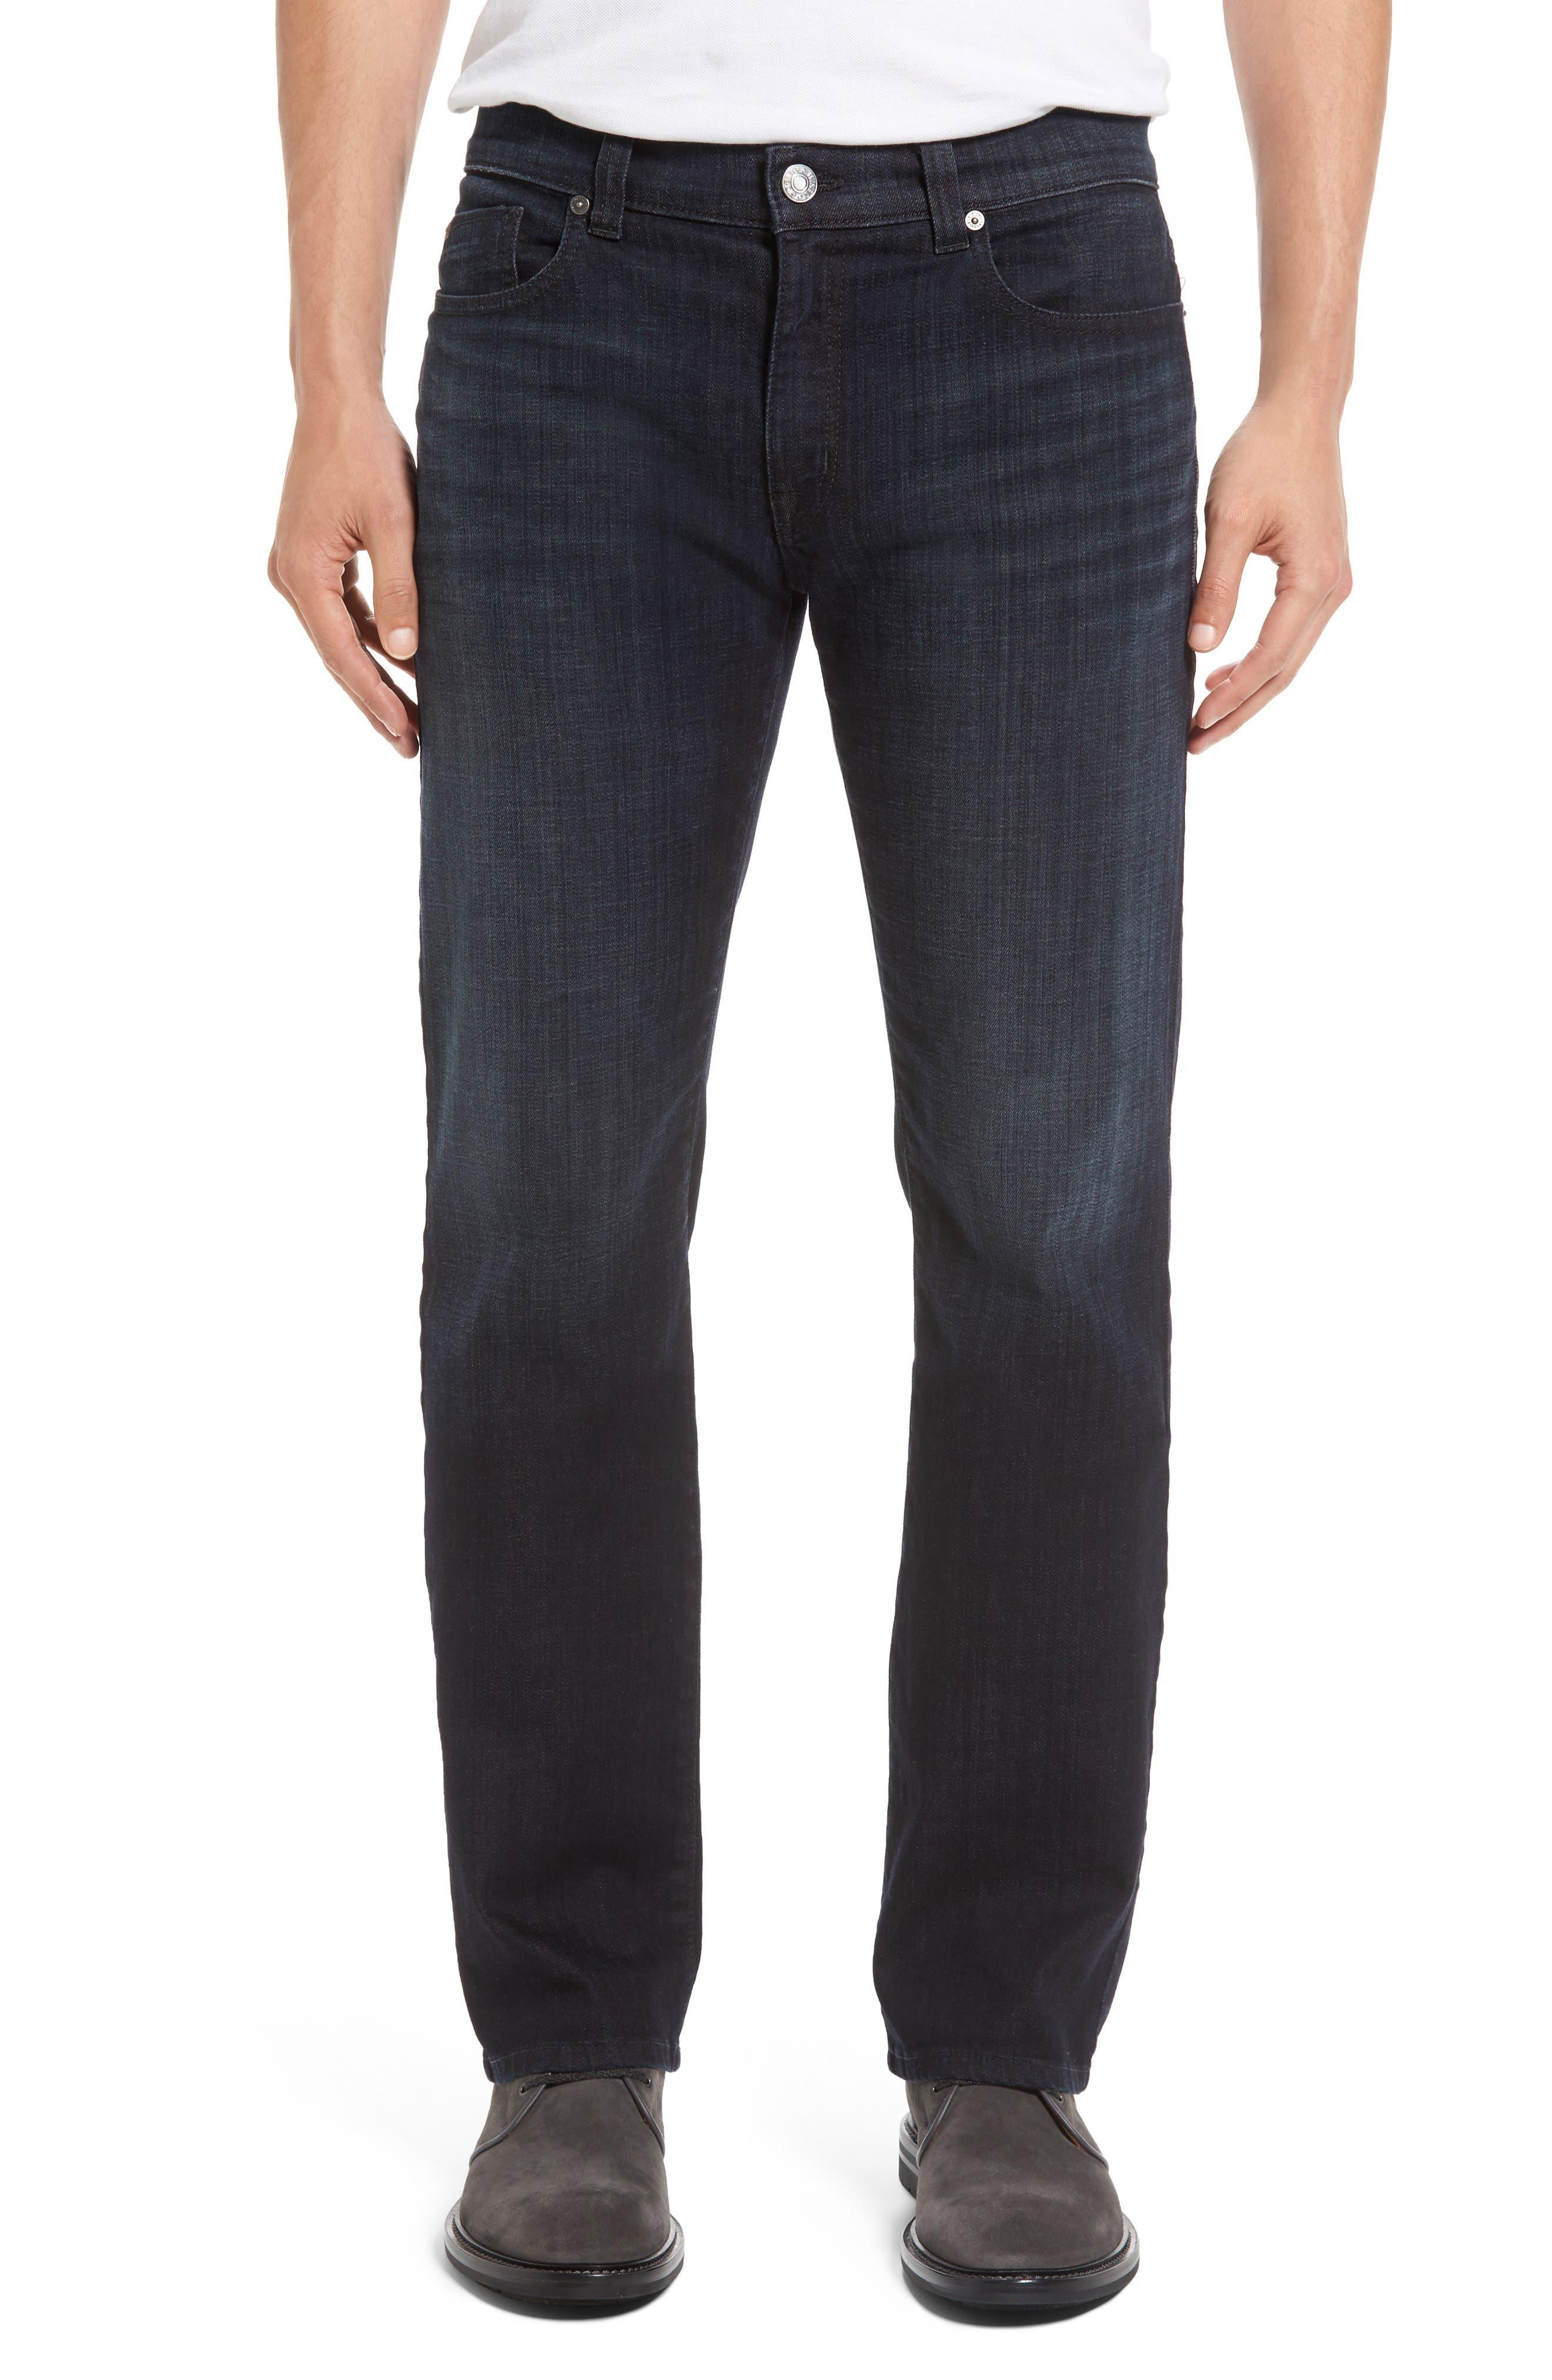 Fidelity Denim 5011 Relaxed Fit Jeans (Harvard)